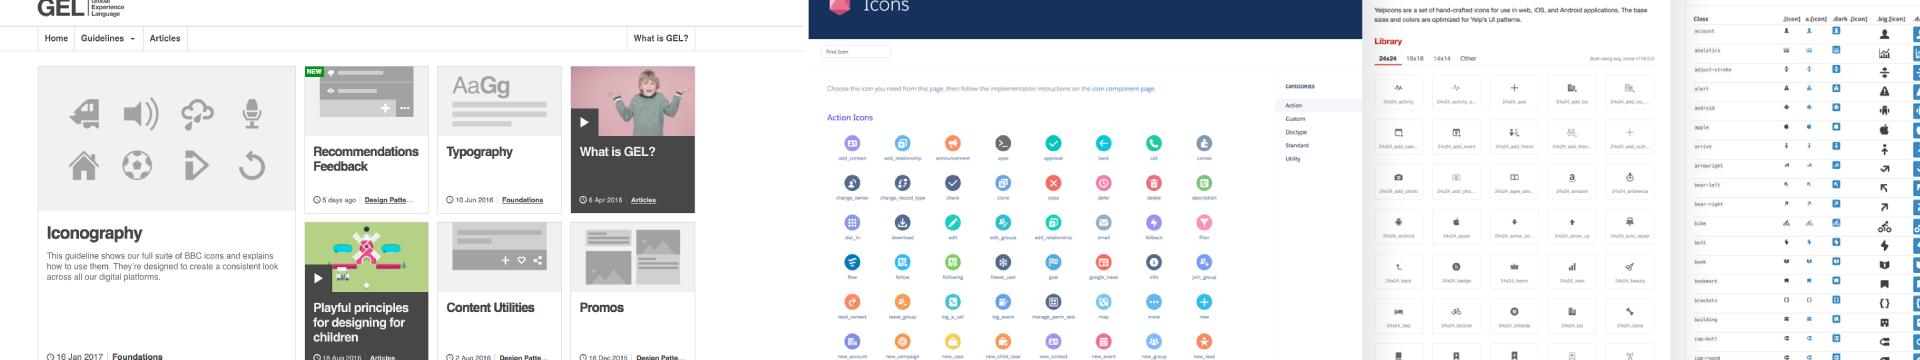 blog introcrea guia estilos startups iconos